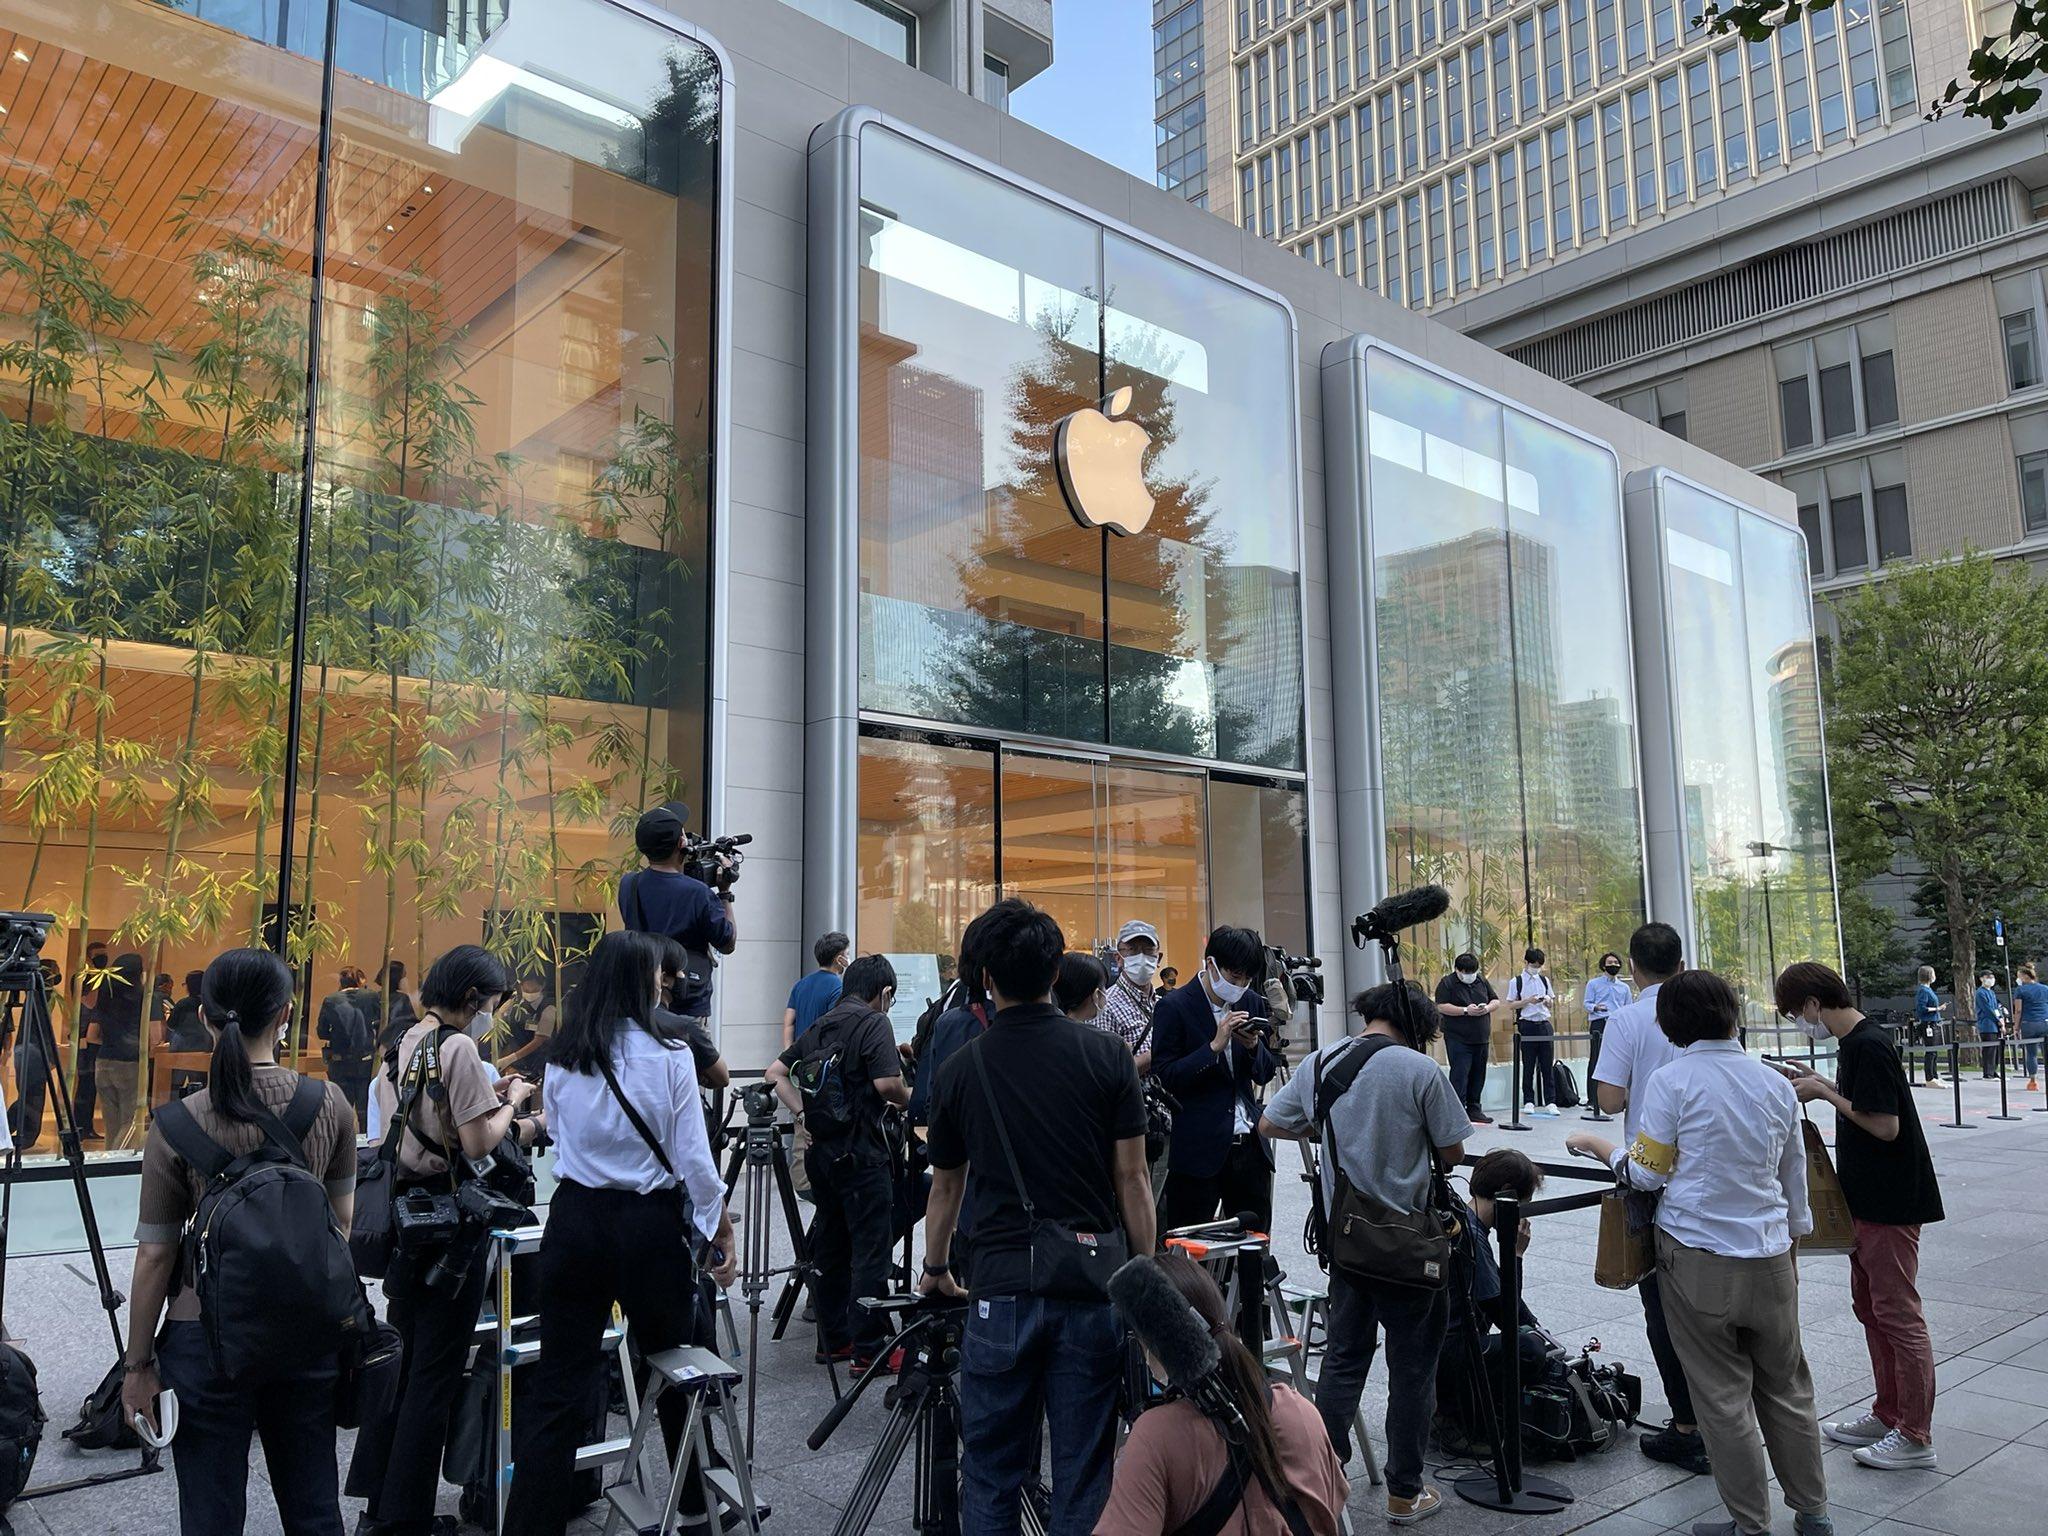 Cảnh xếp hàng mua iPhone 13 tại Apple Store ở Marunouchi. Ảnh: Gadgettouch